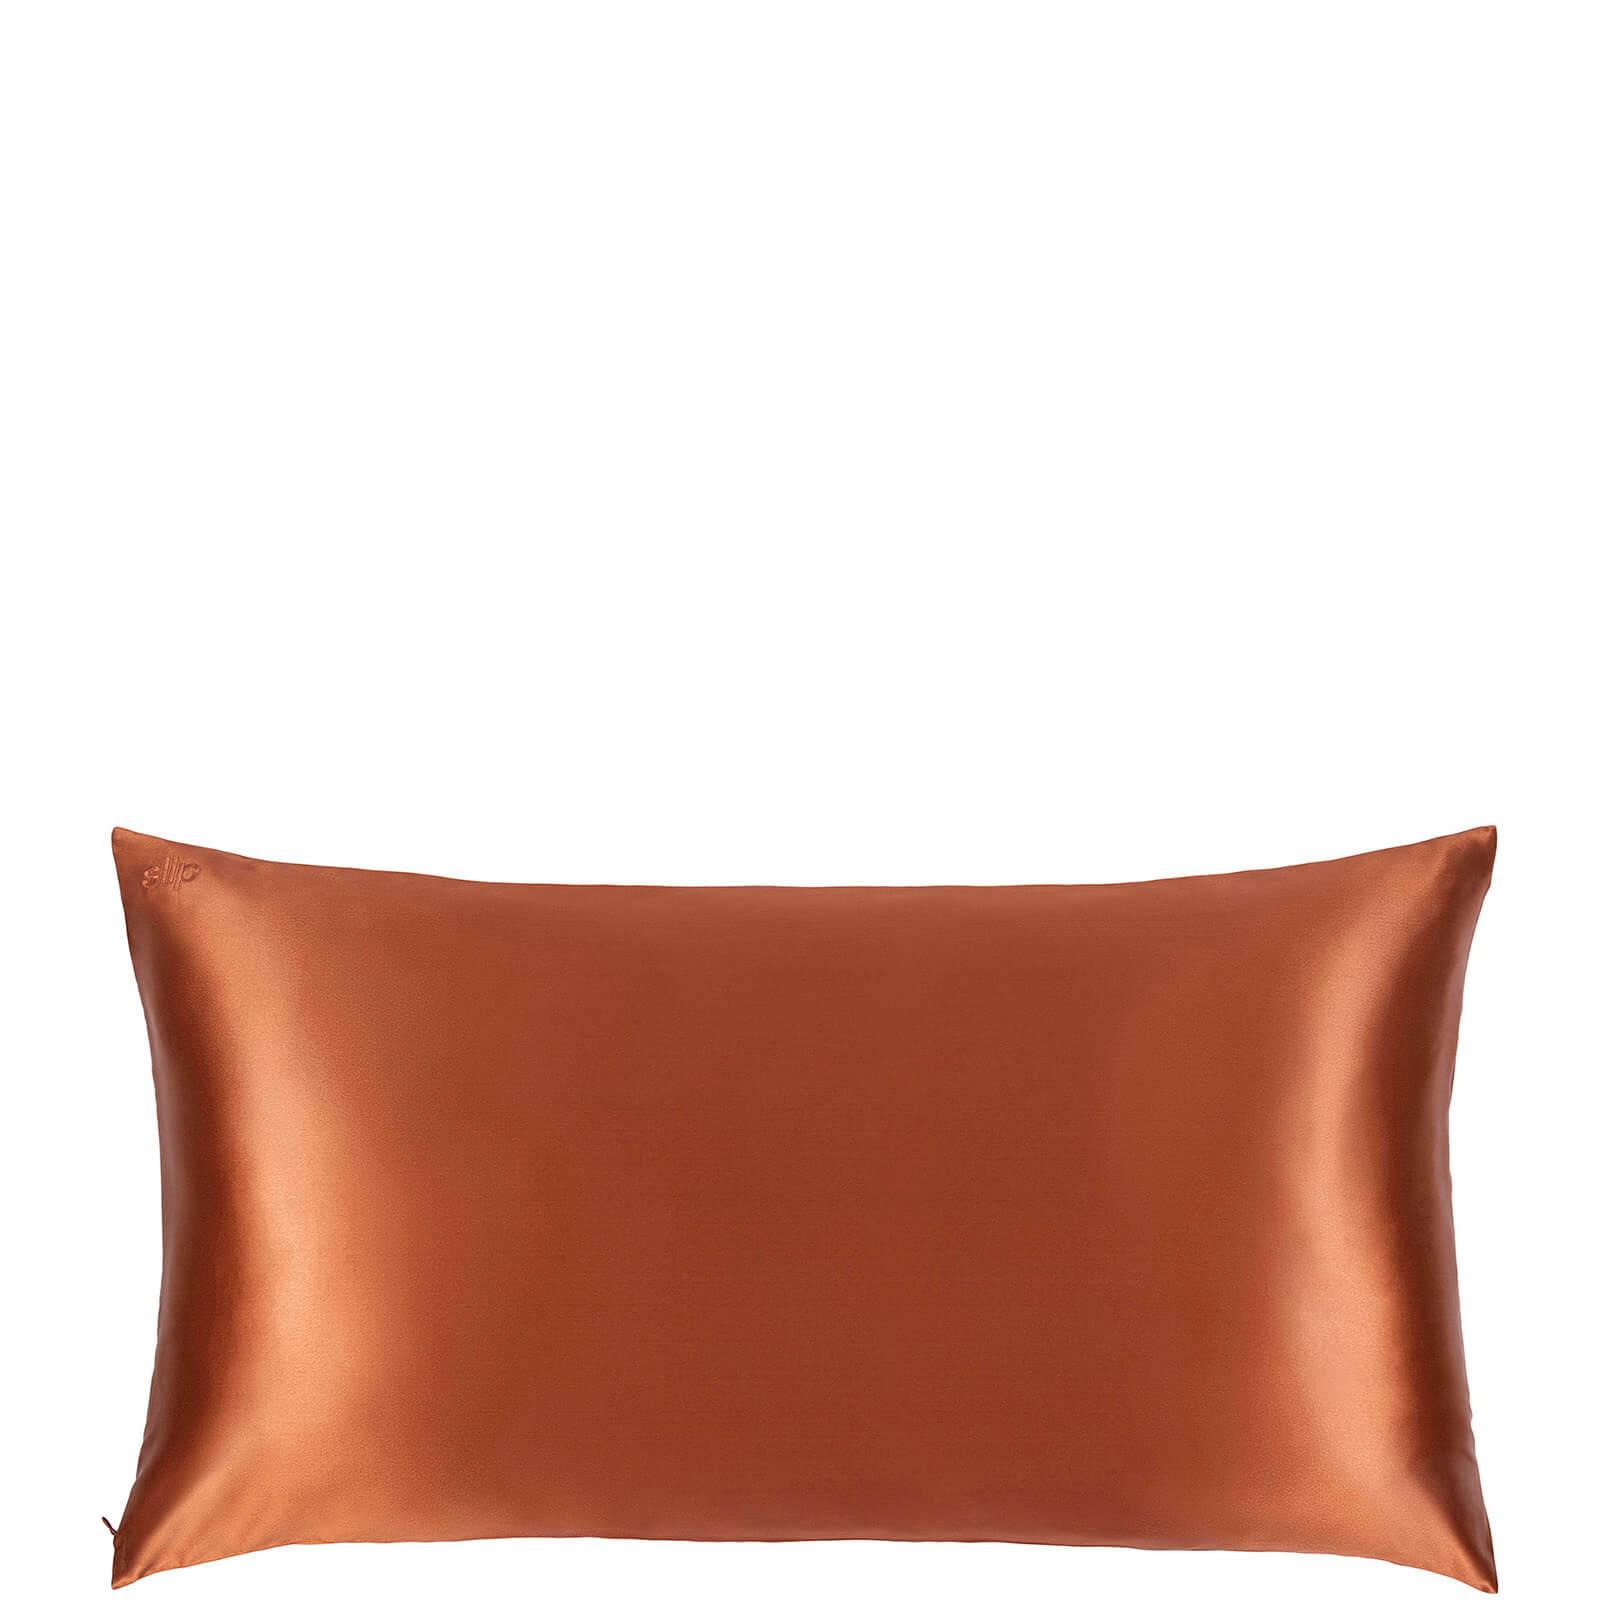 Slip Silk Pillowcase King (Various Colors) - Dusk